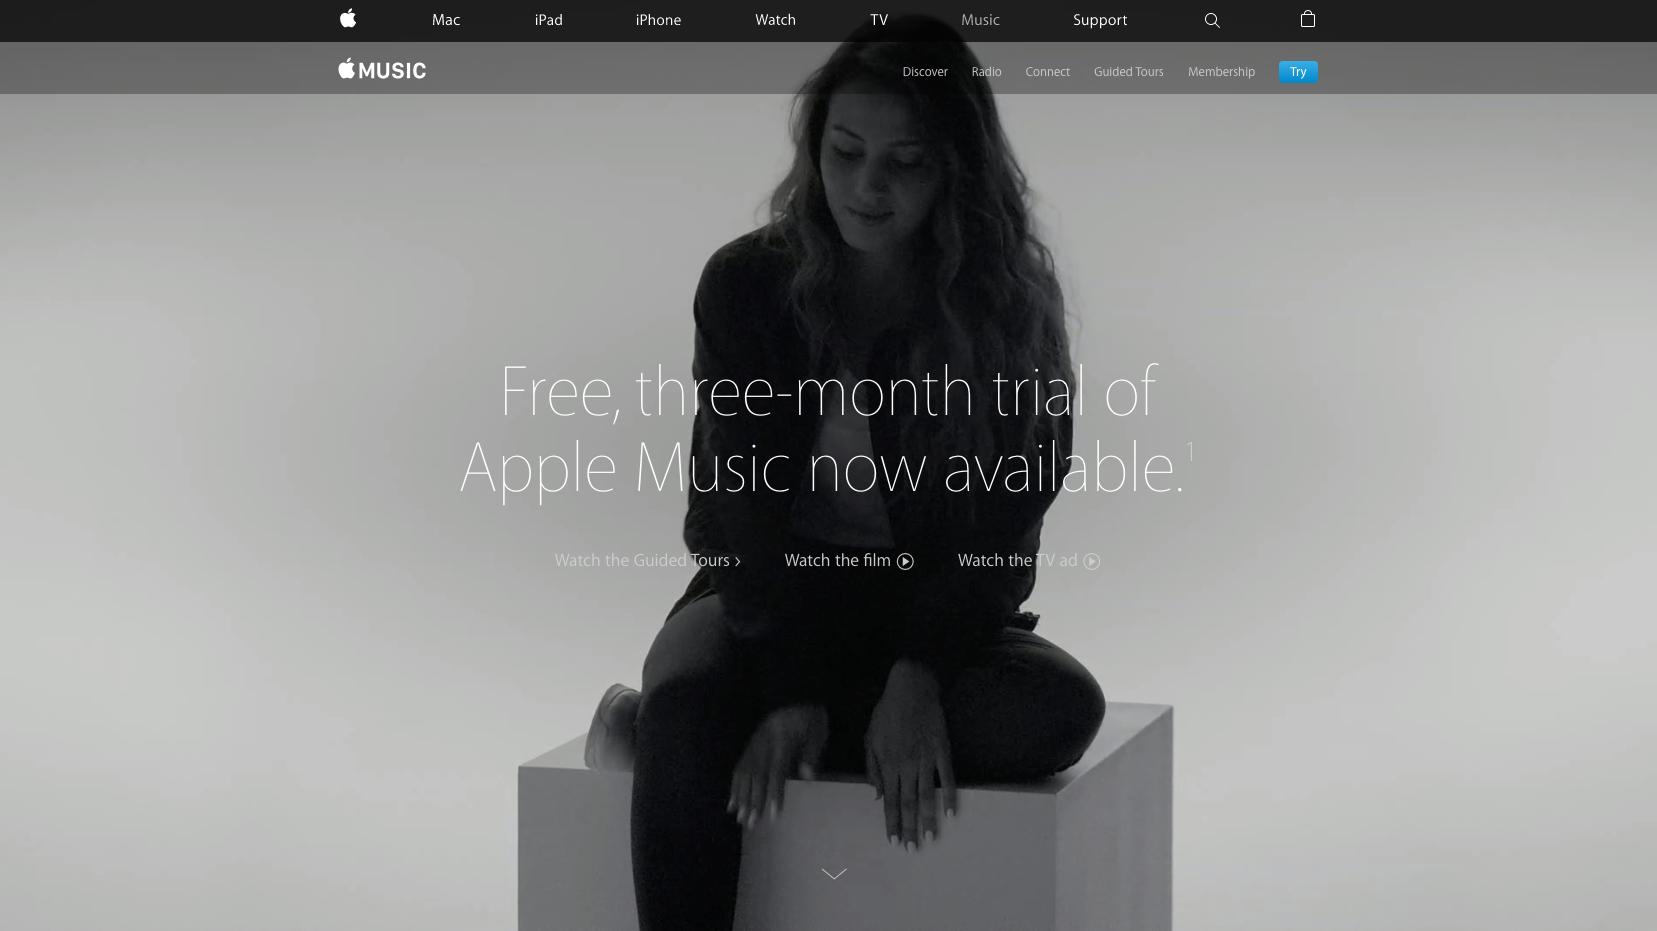 apple music website